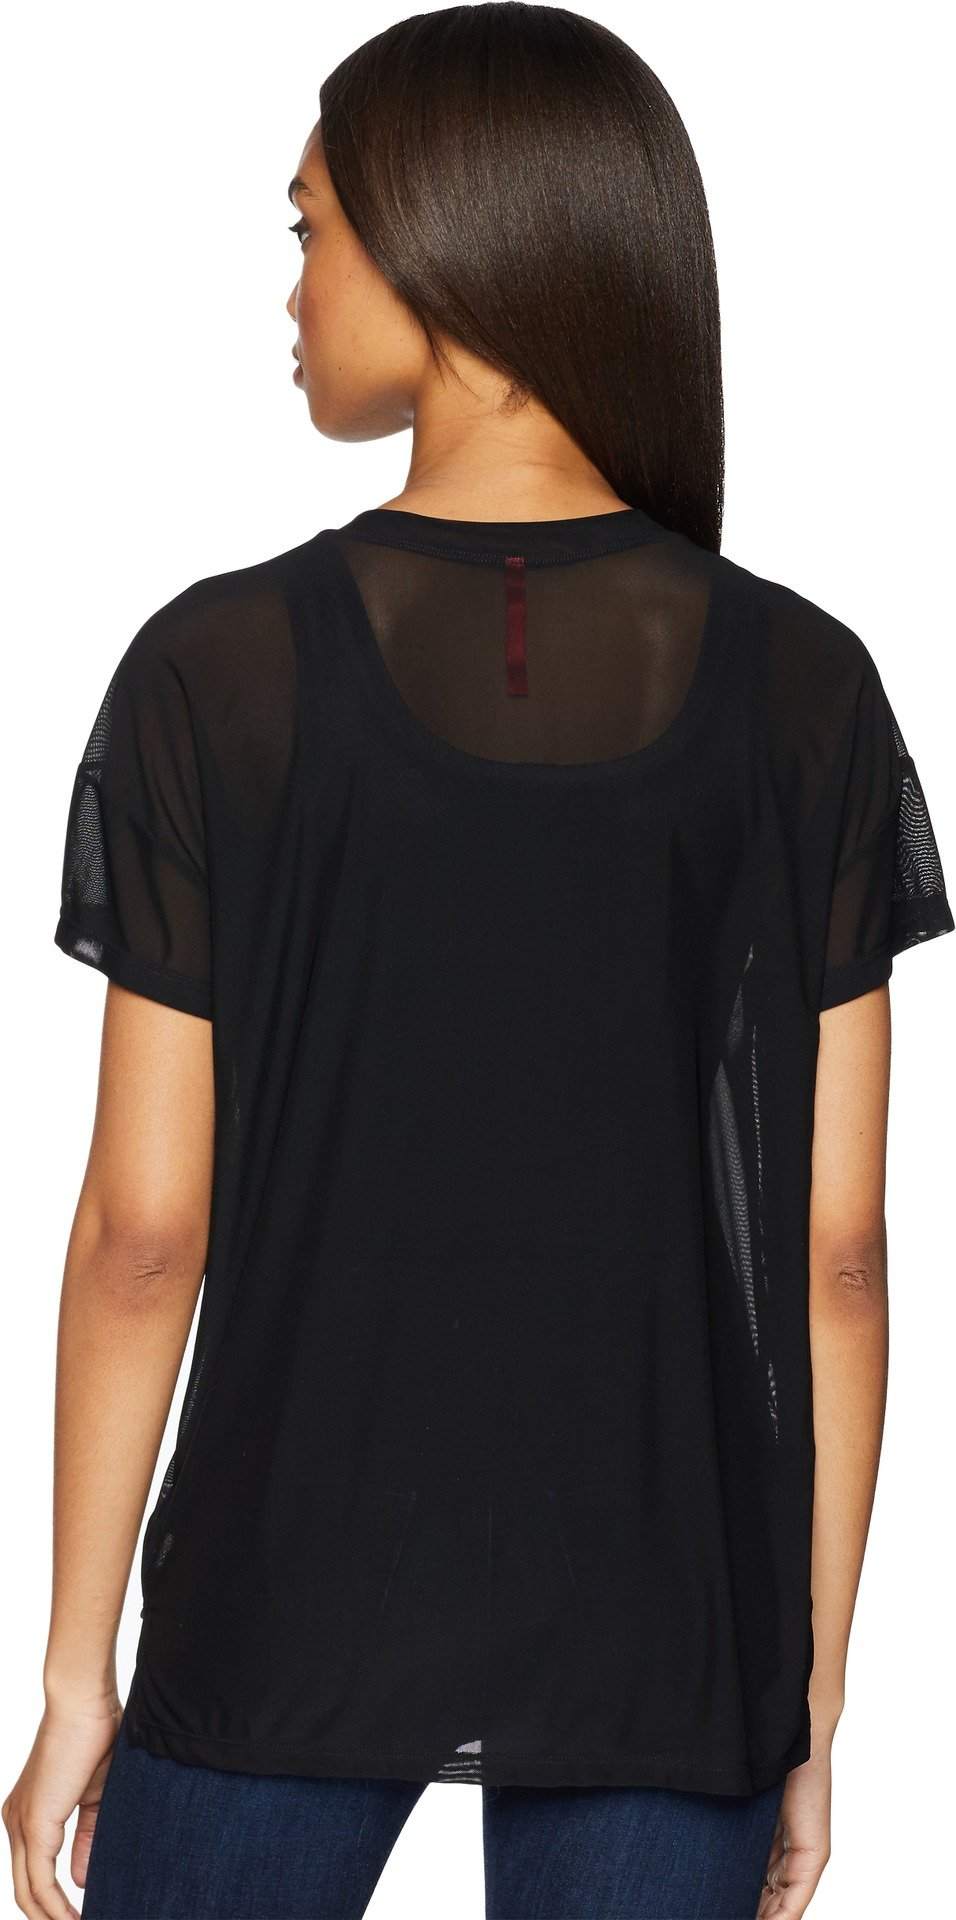 UNIONBAY Women's Fine Mesh Top, Black, Large by UNIONBAY (Image #2)